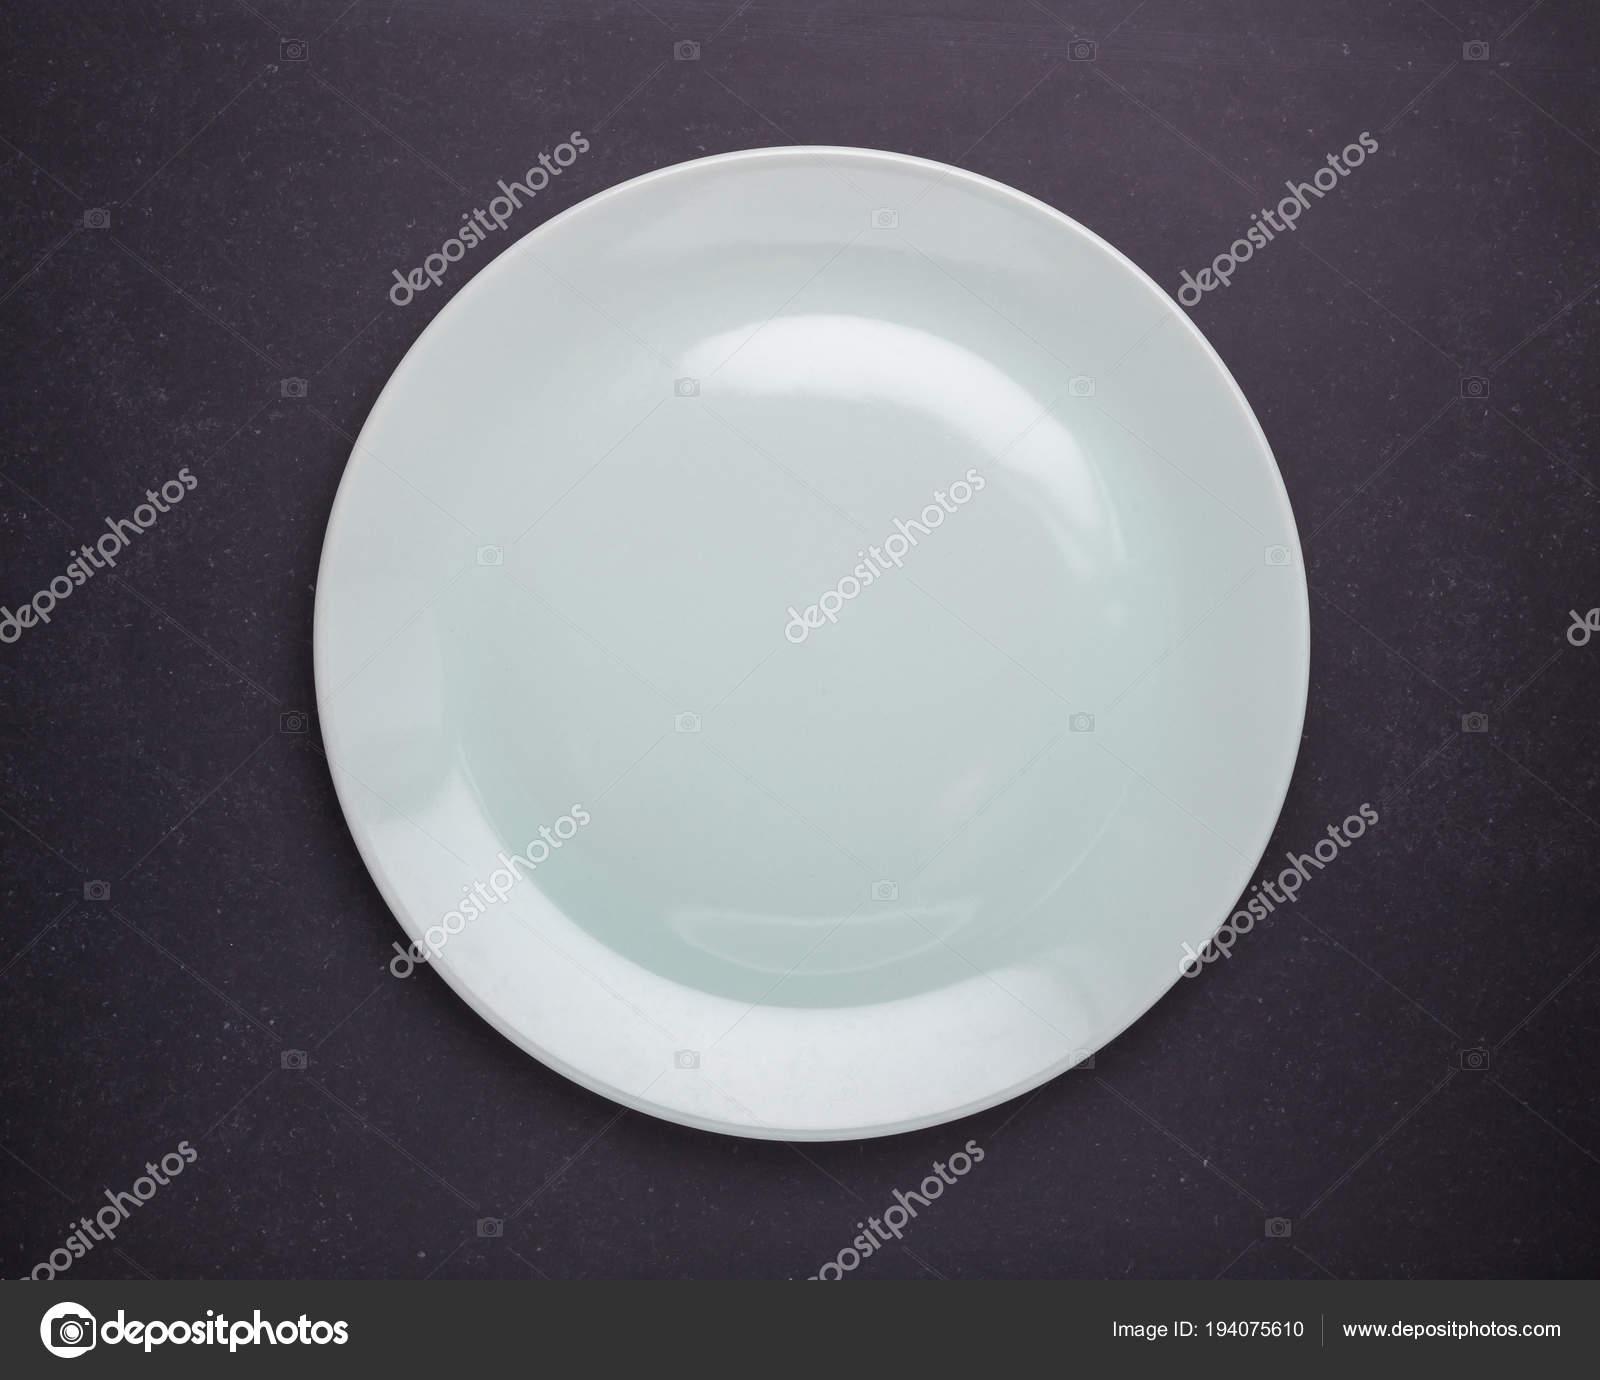 ceramic kitchen top tile floor ideas 黑石桌上的空白色新陶瓷厨房碟backgr 图库照片 c phanuwatnandee 194075610 顶部查看空白色新陶瓷厨房碟黑色石材桌面背景 照片作者phanuwatnandee